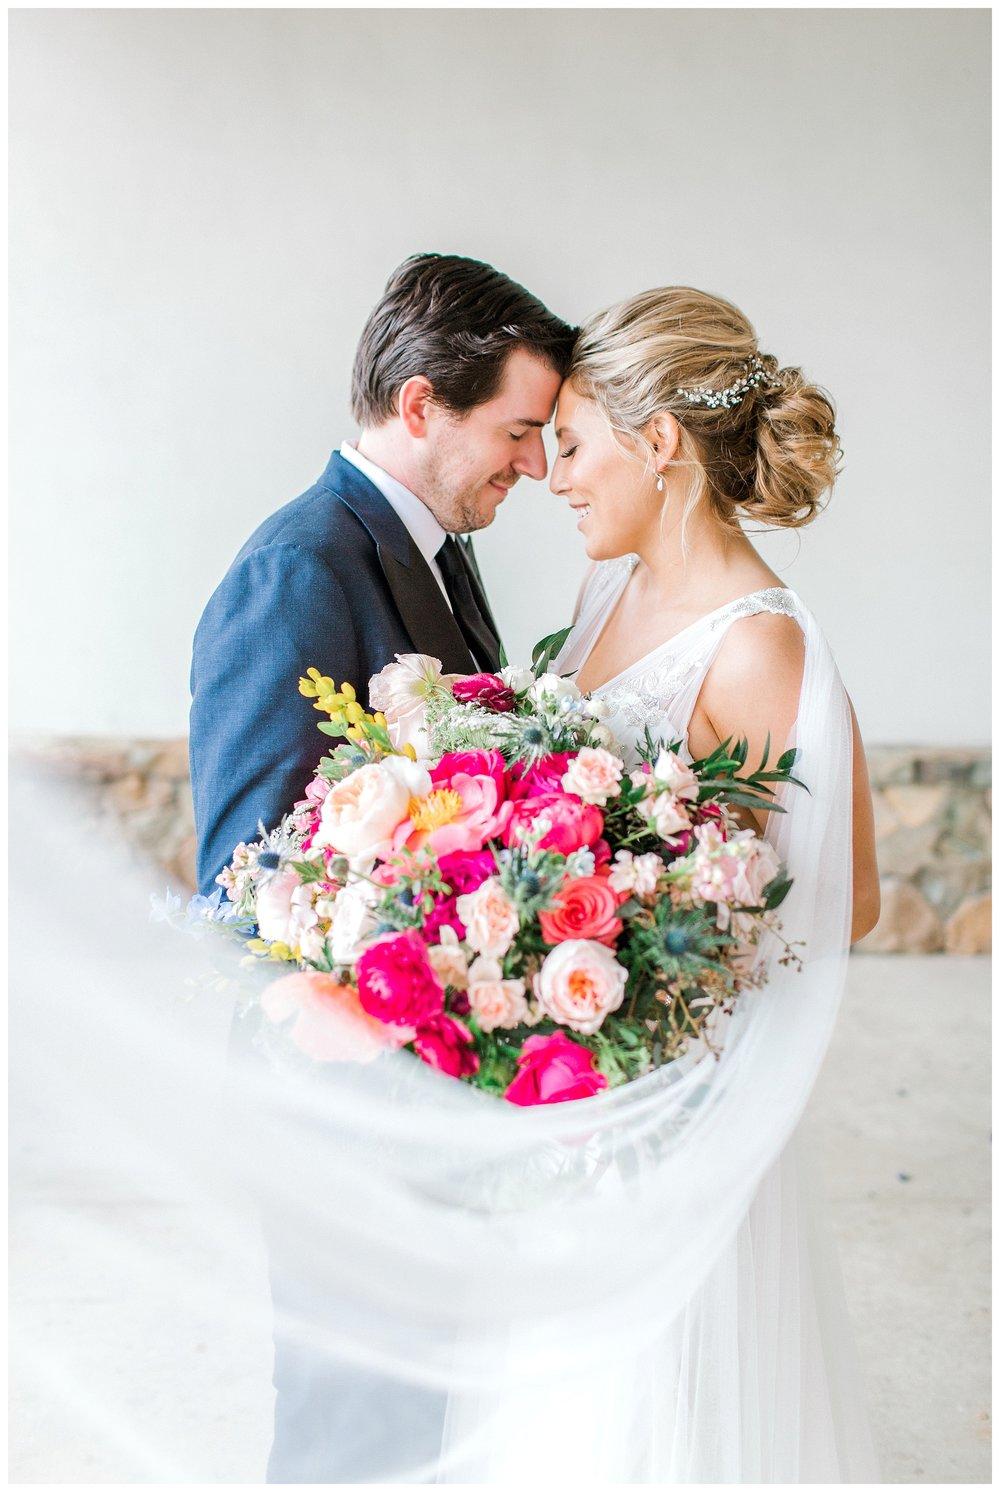 Stone Tower Winery Wedding Virginia Wedding Photographer_0048.jpg